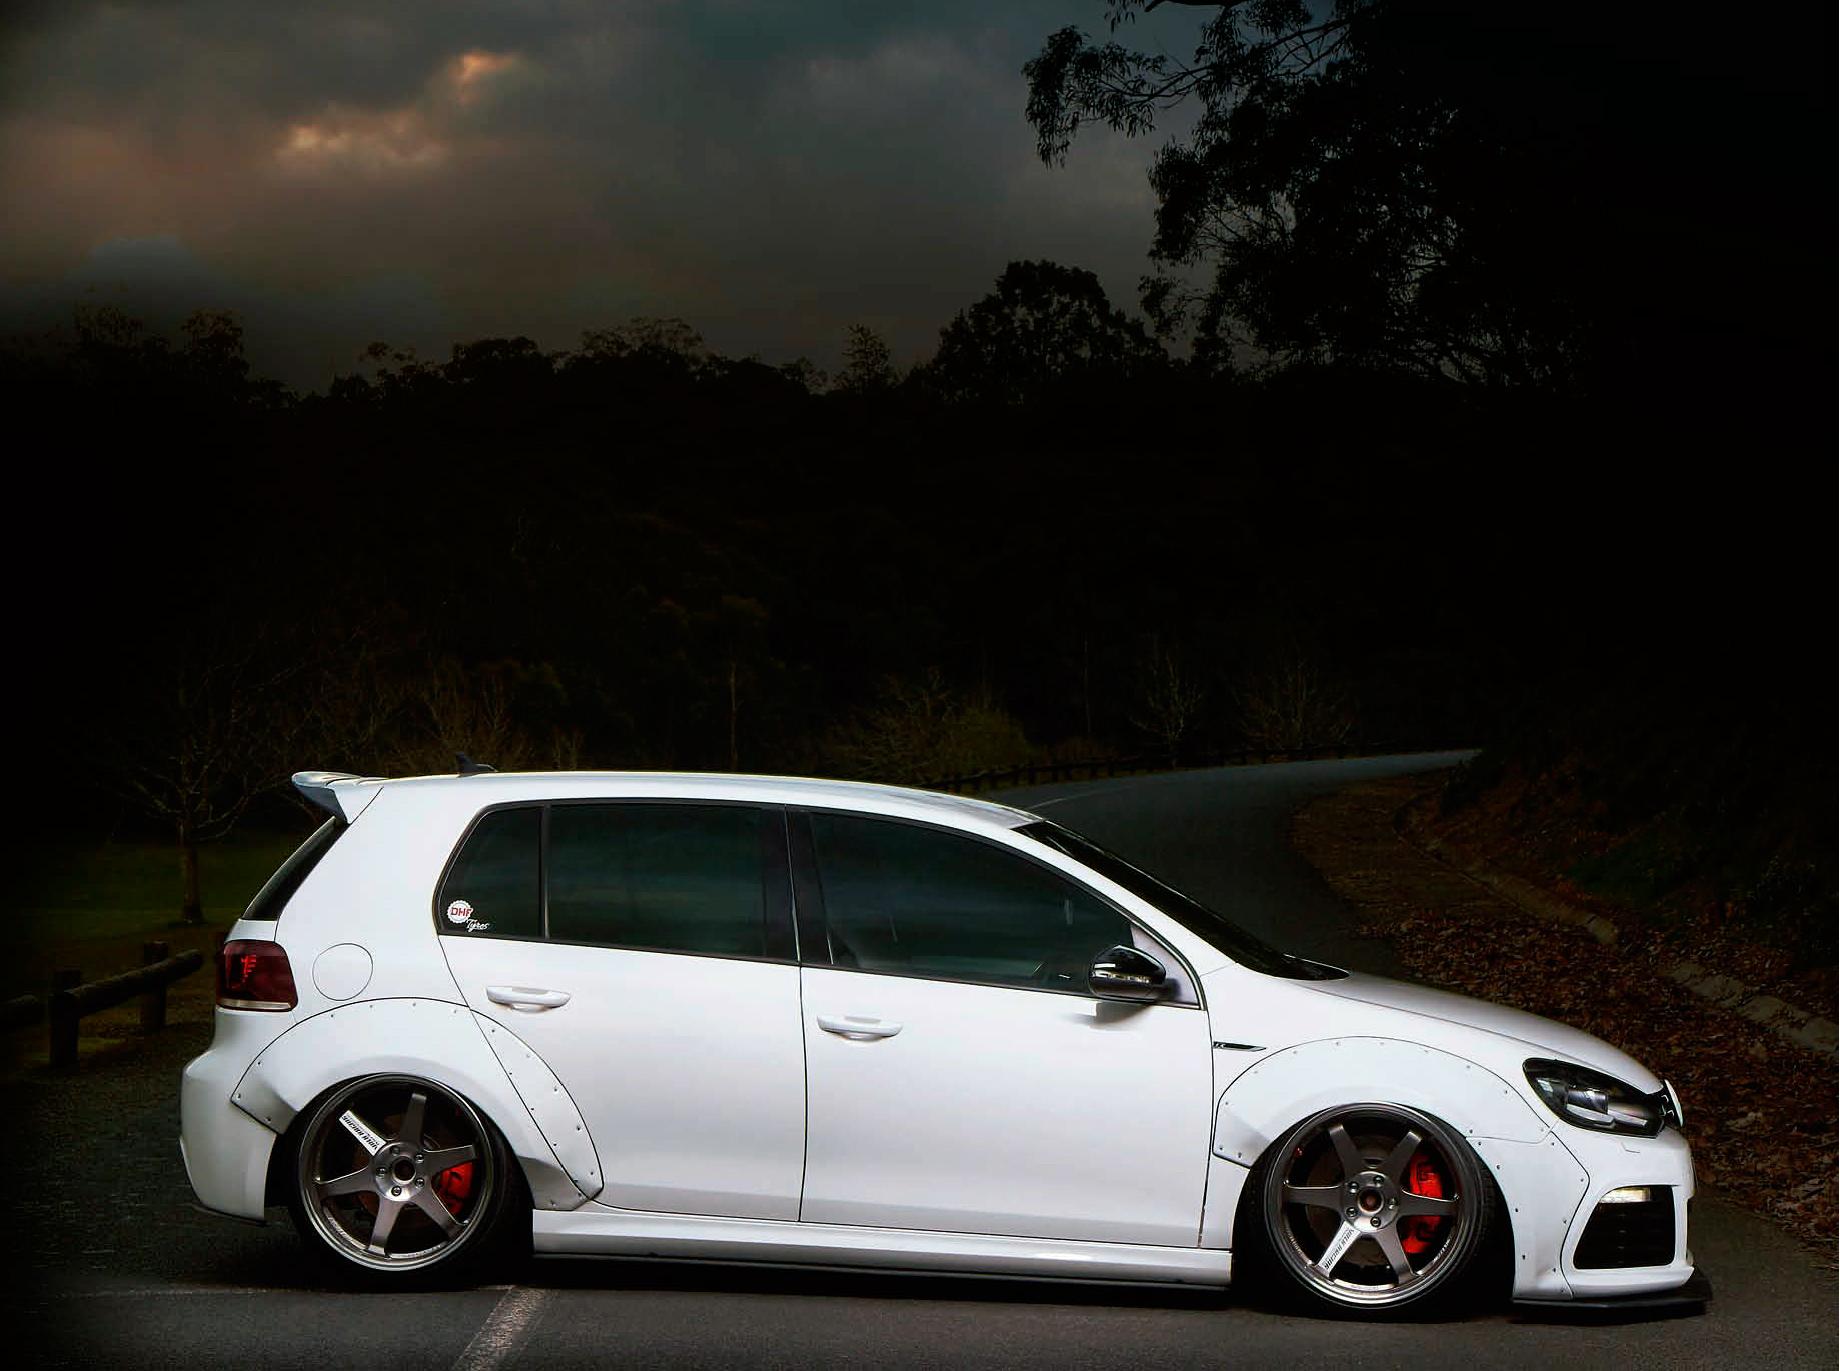 Vw golf r mk6 cars one love - Volkswagen Golf R Mk6 Tuned